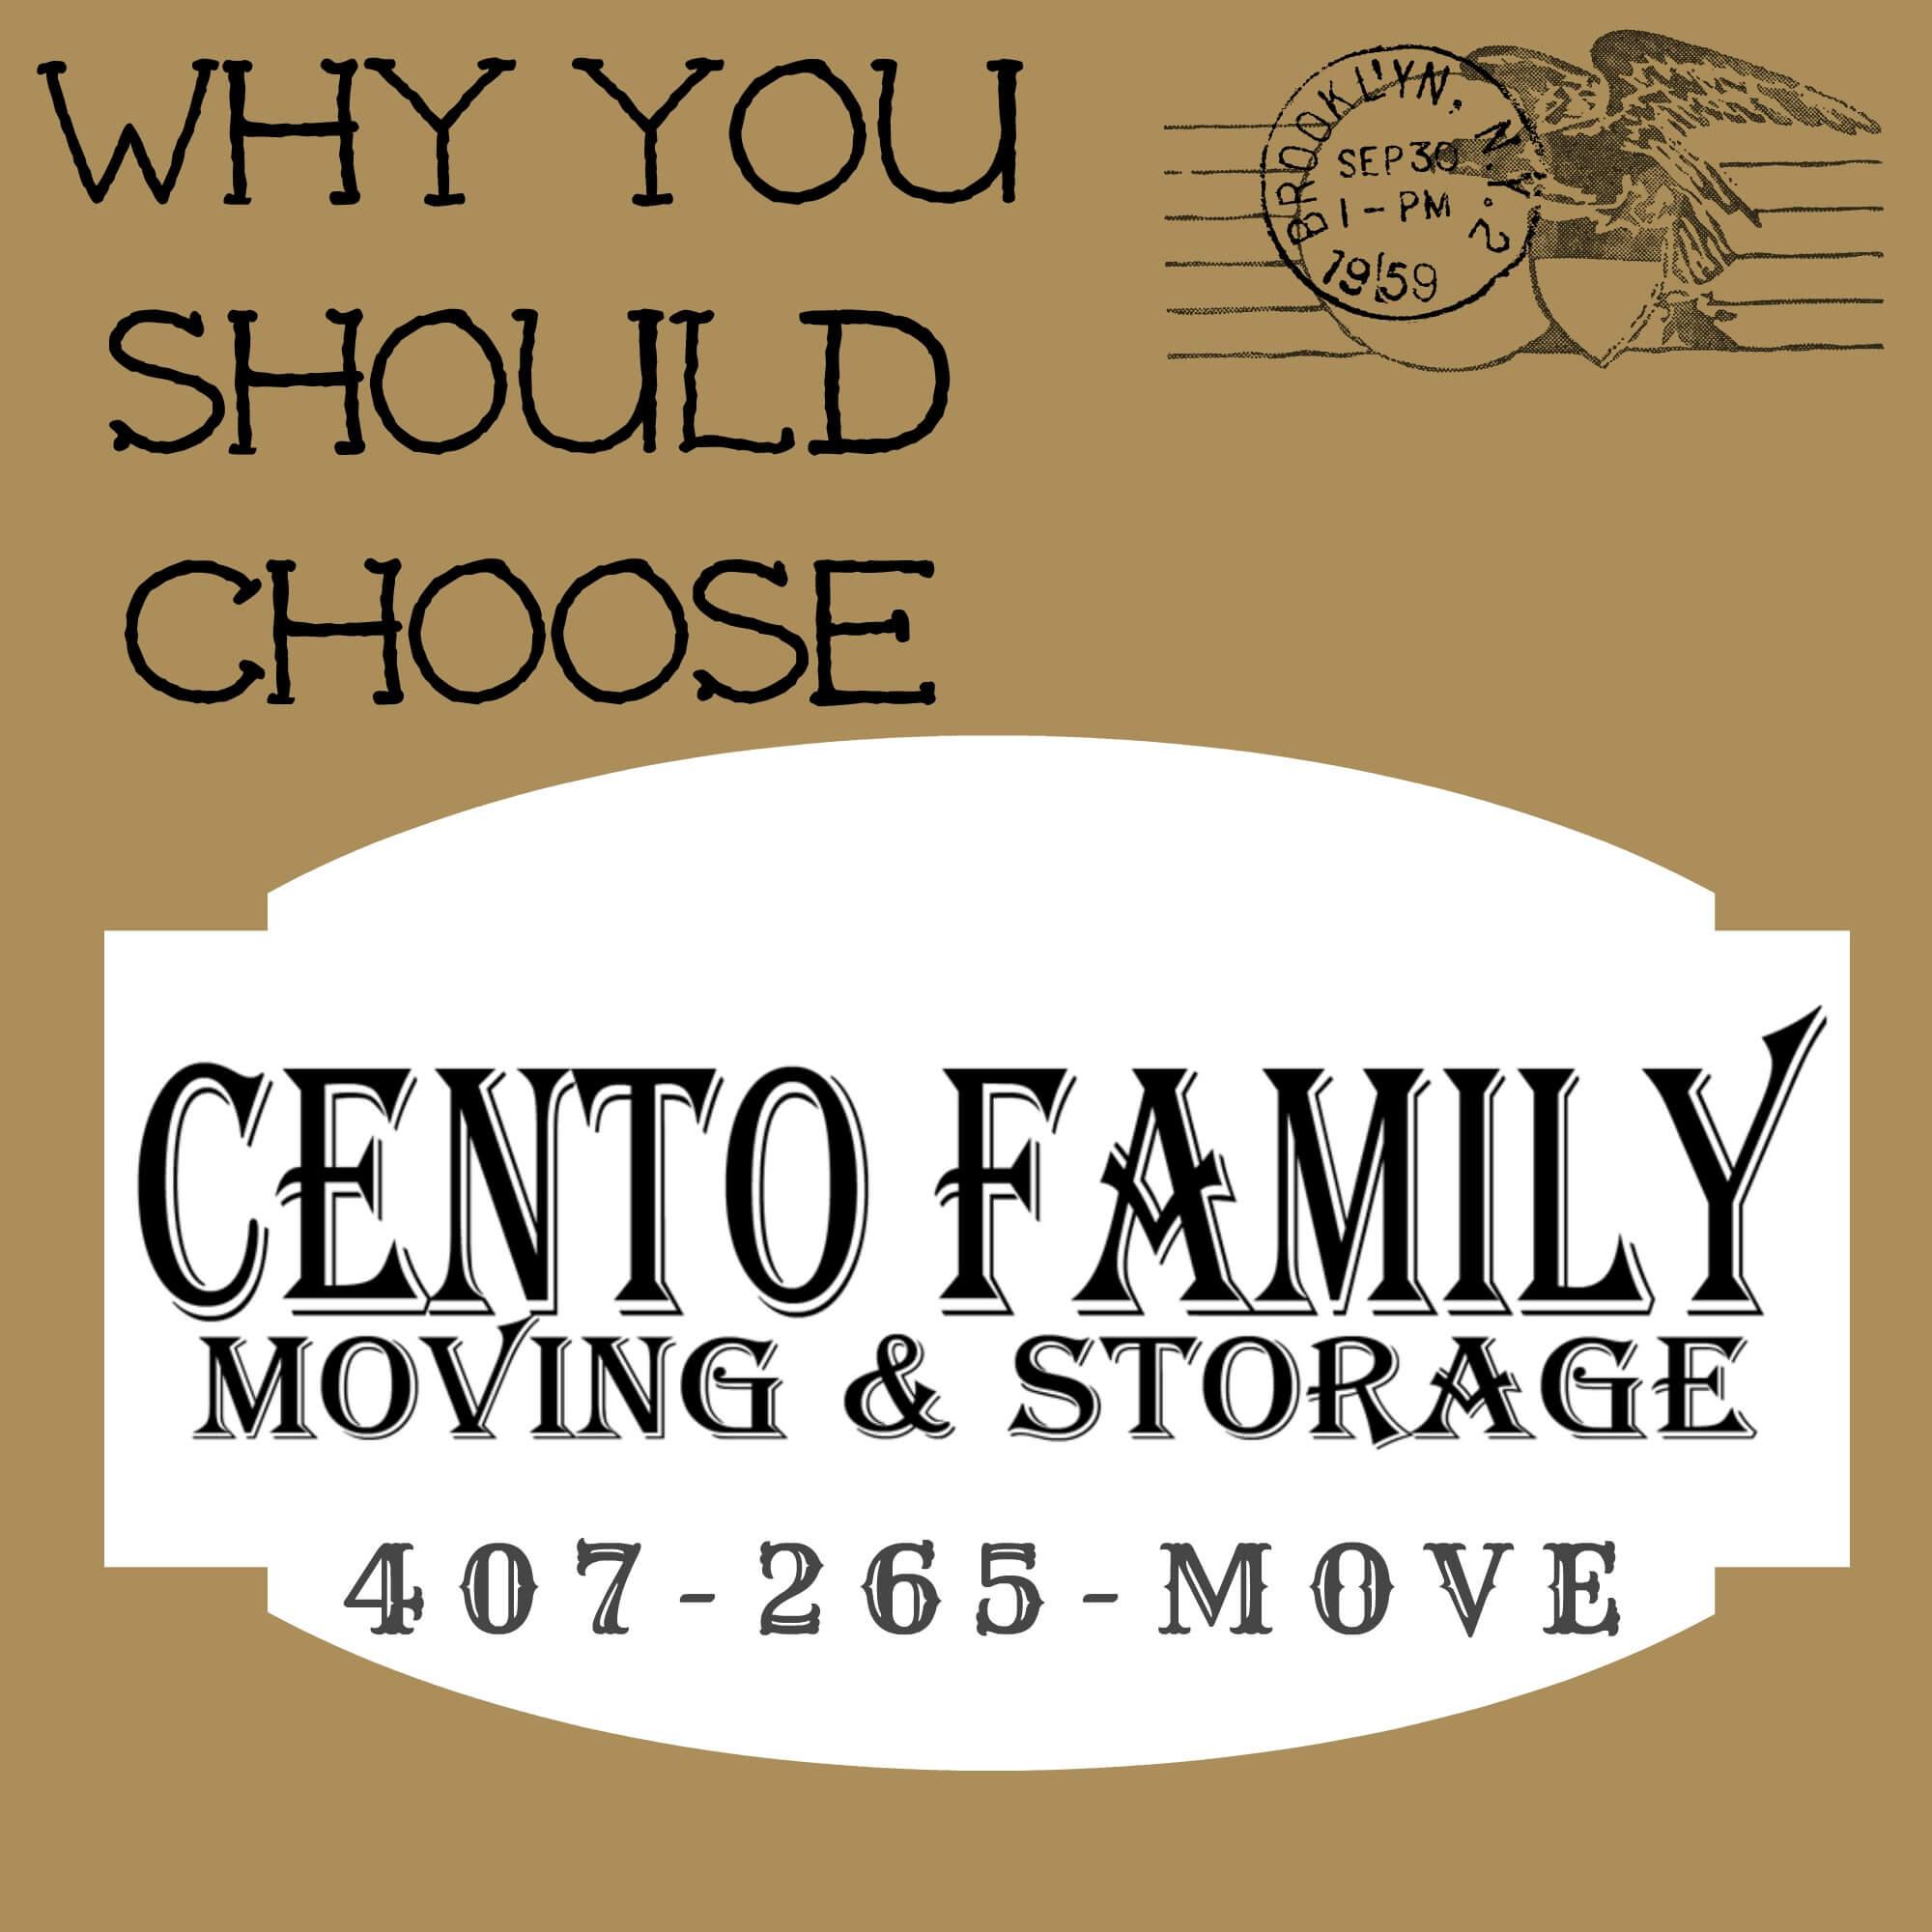 Moving Company Jobs with Cento Family Moving